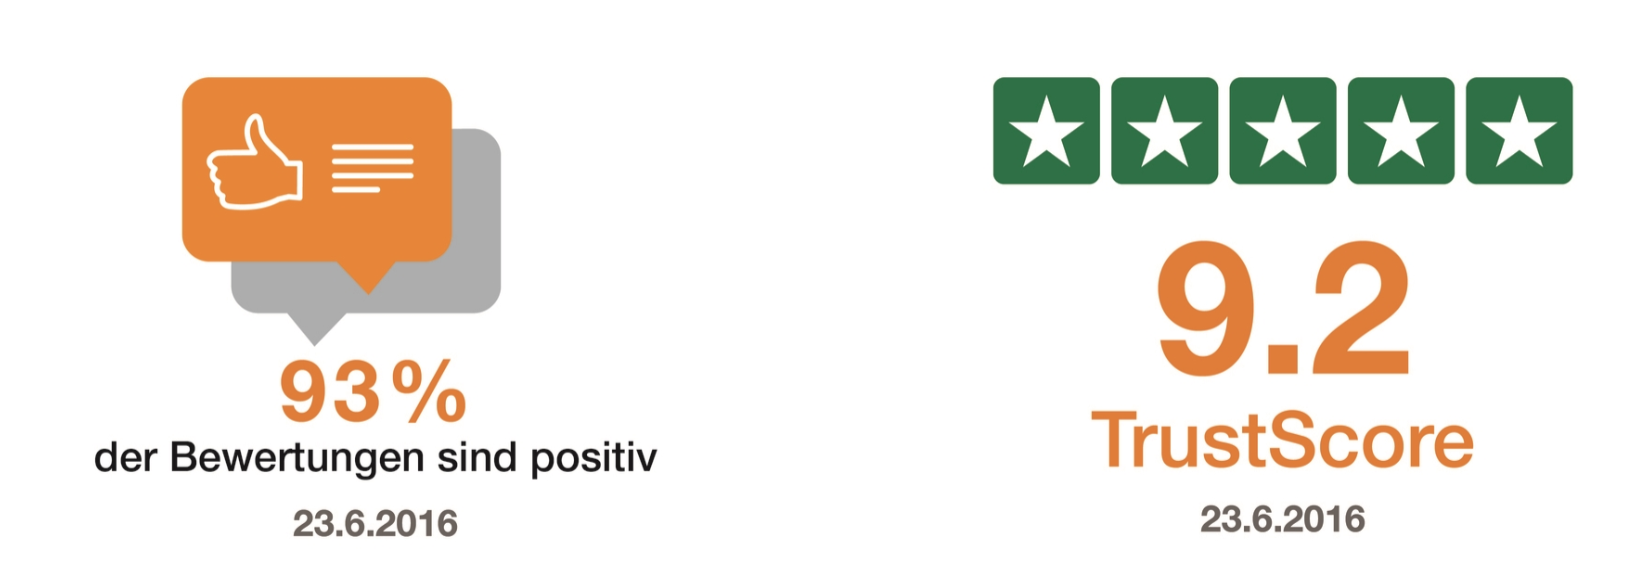 Ratioform - Positiv Berwertungen